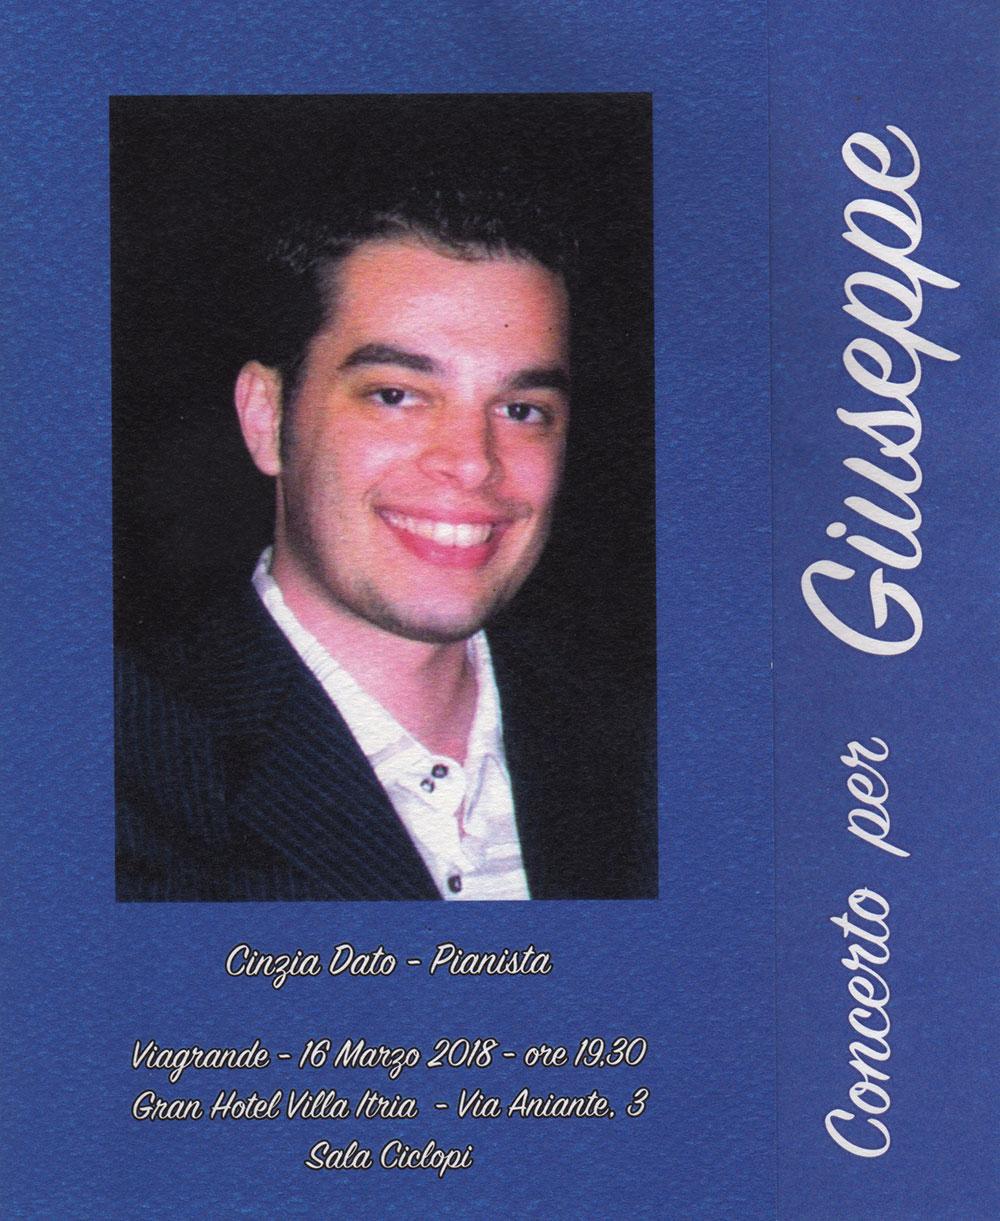 Viagrande. Concerto per Giuseppe